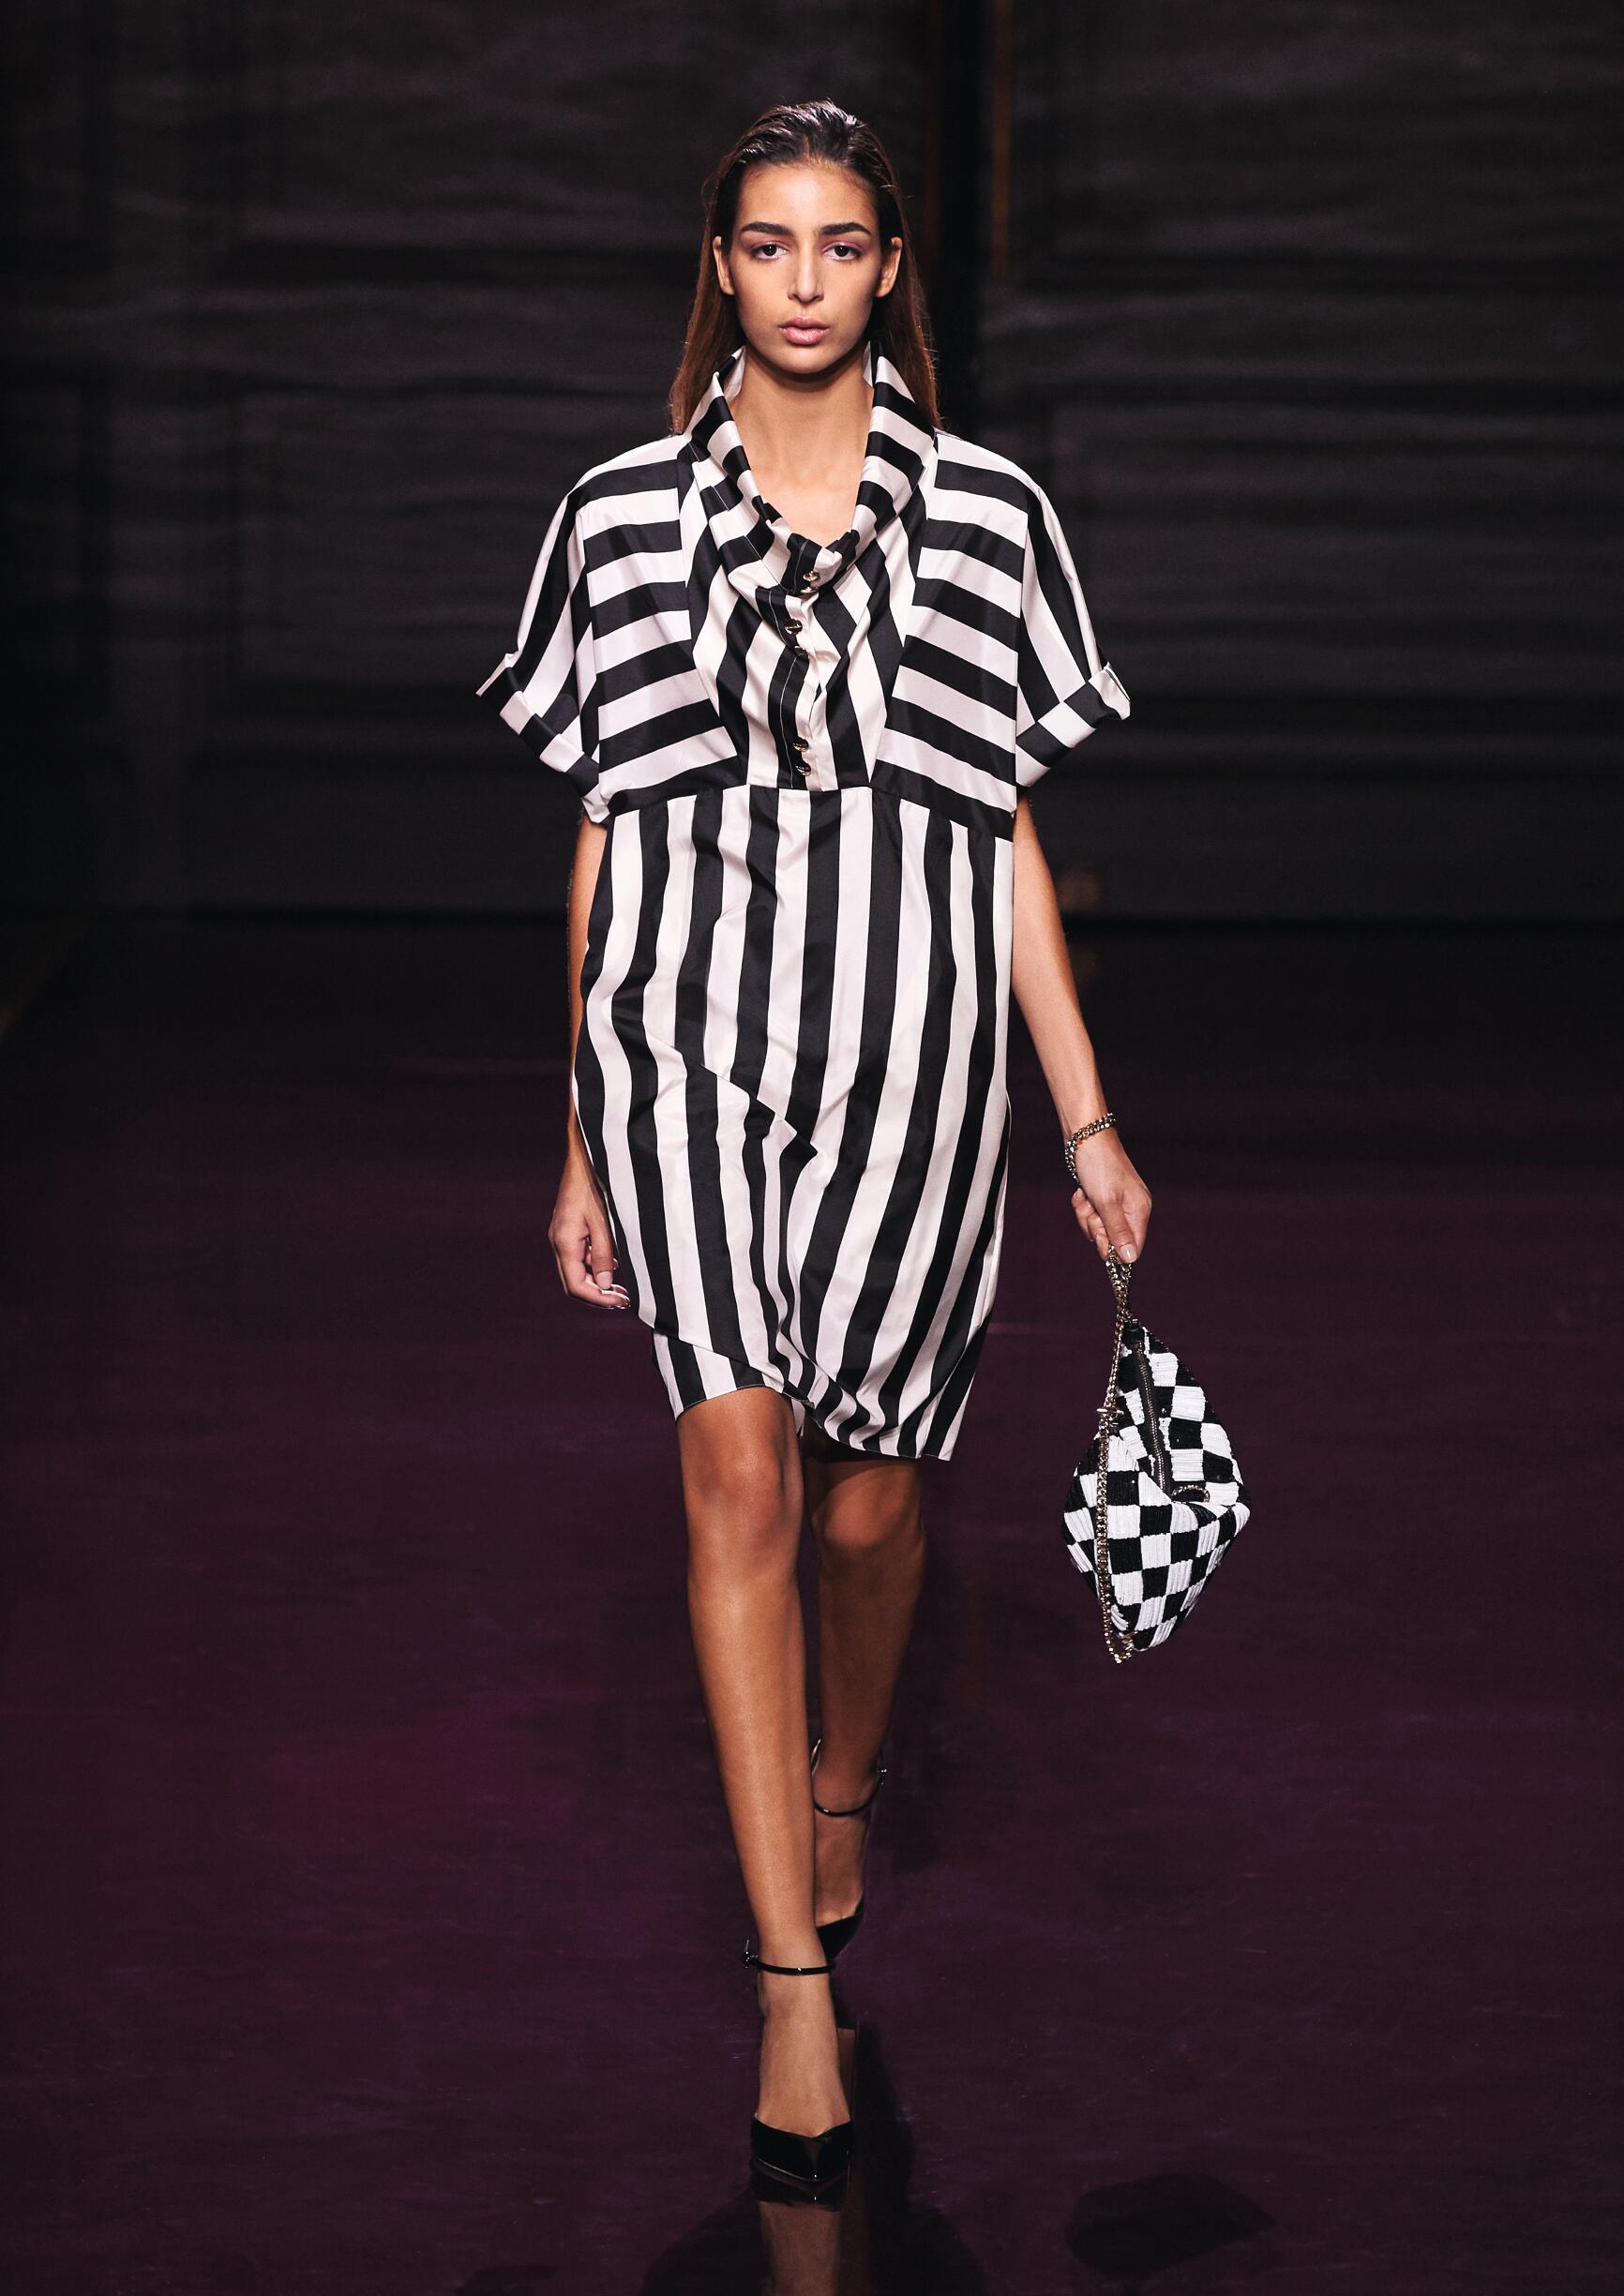 Fashion Woman Model Nina Ricci Catwalk